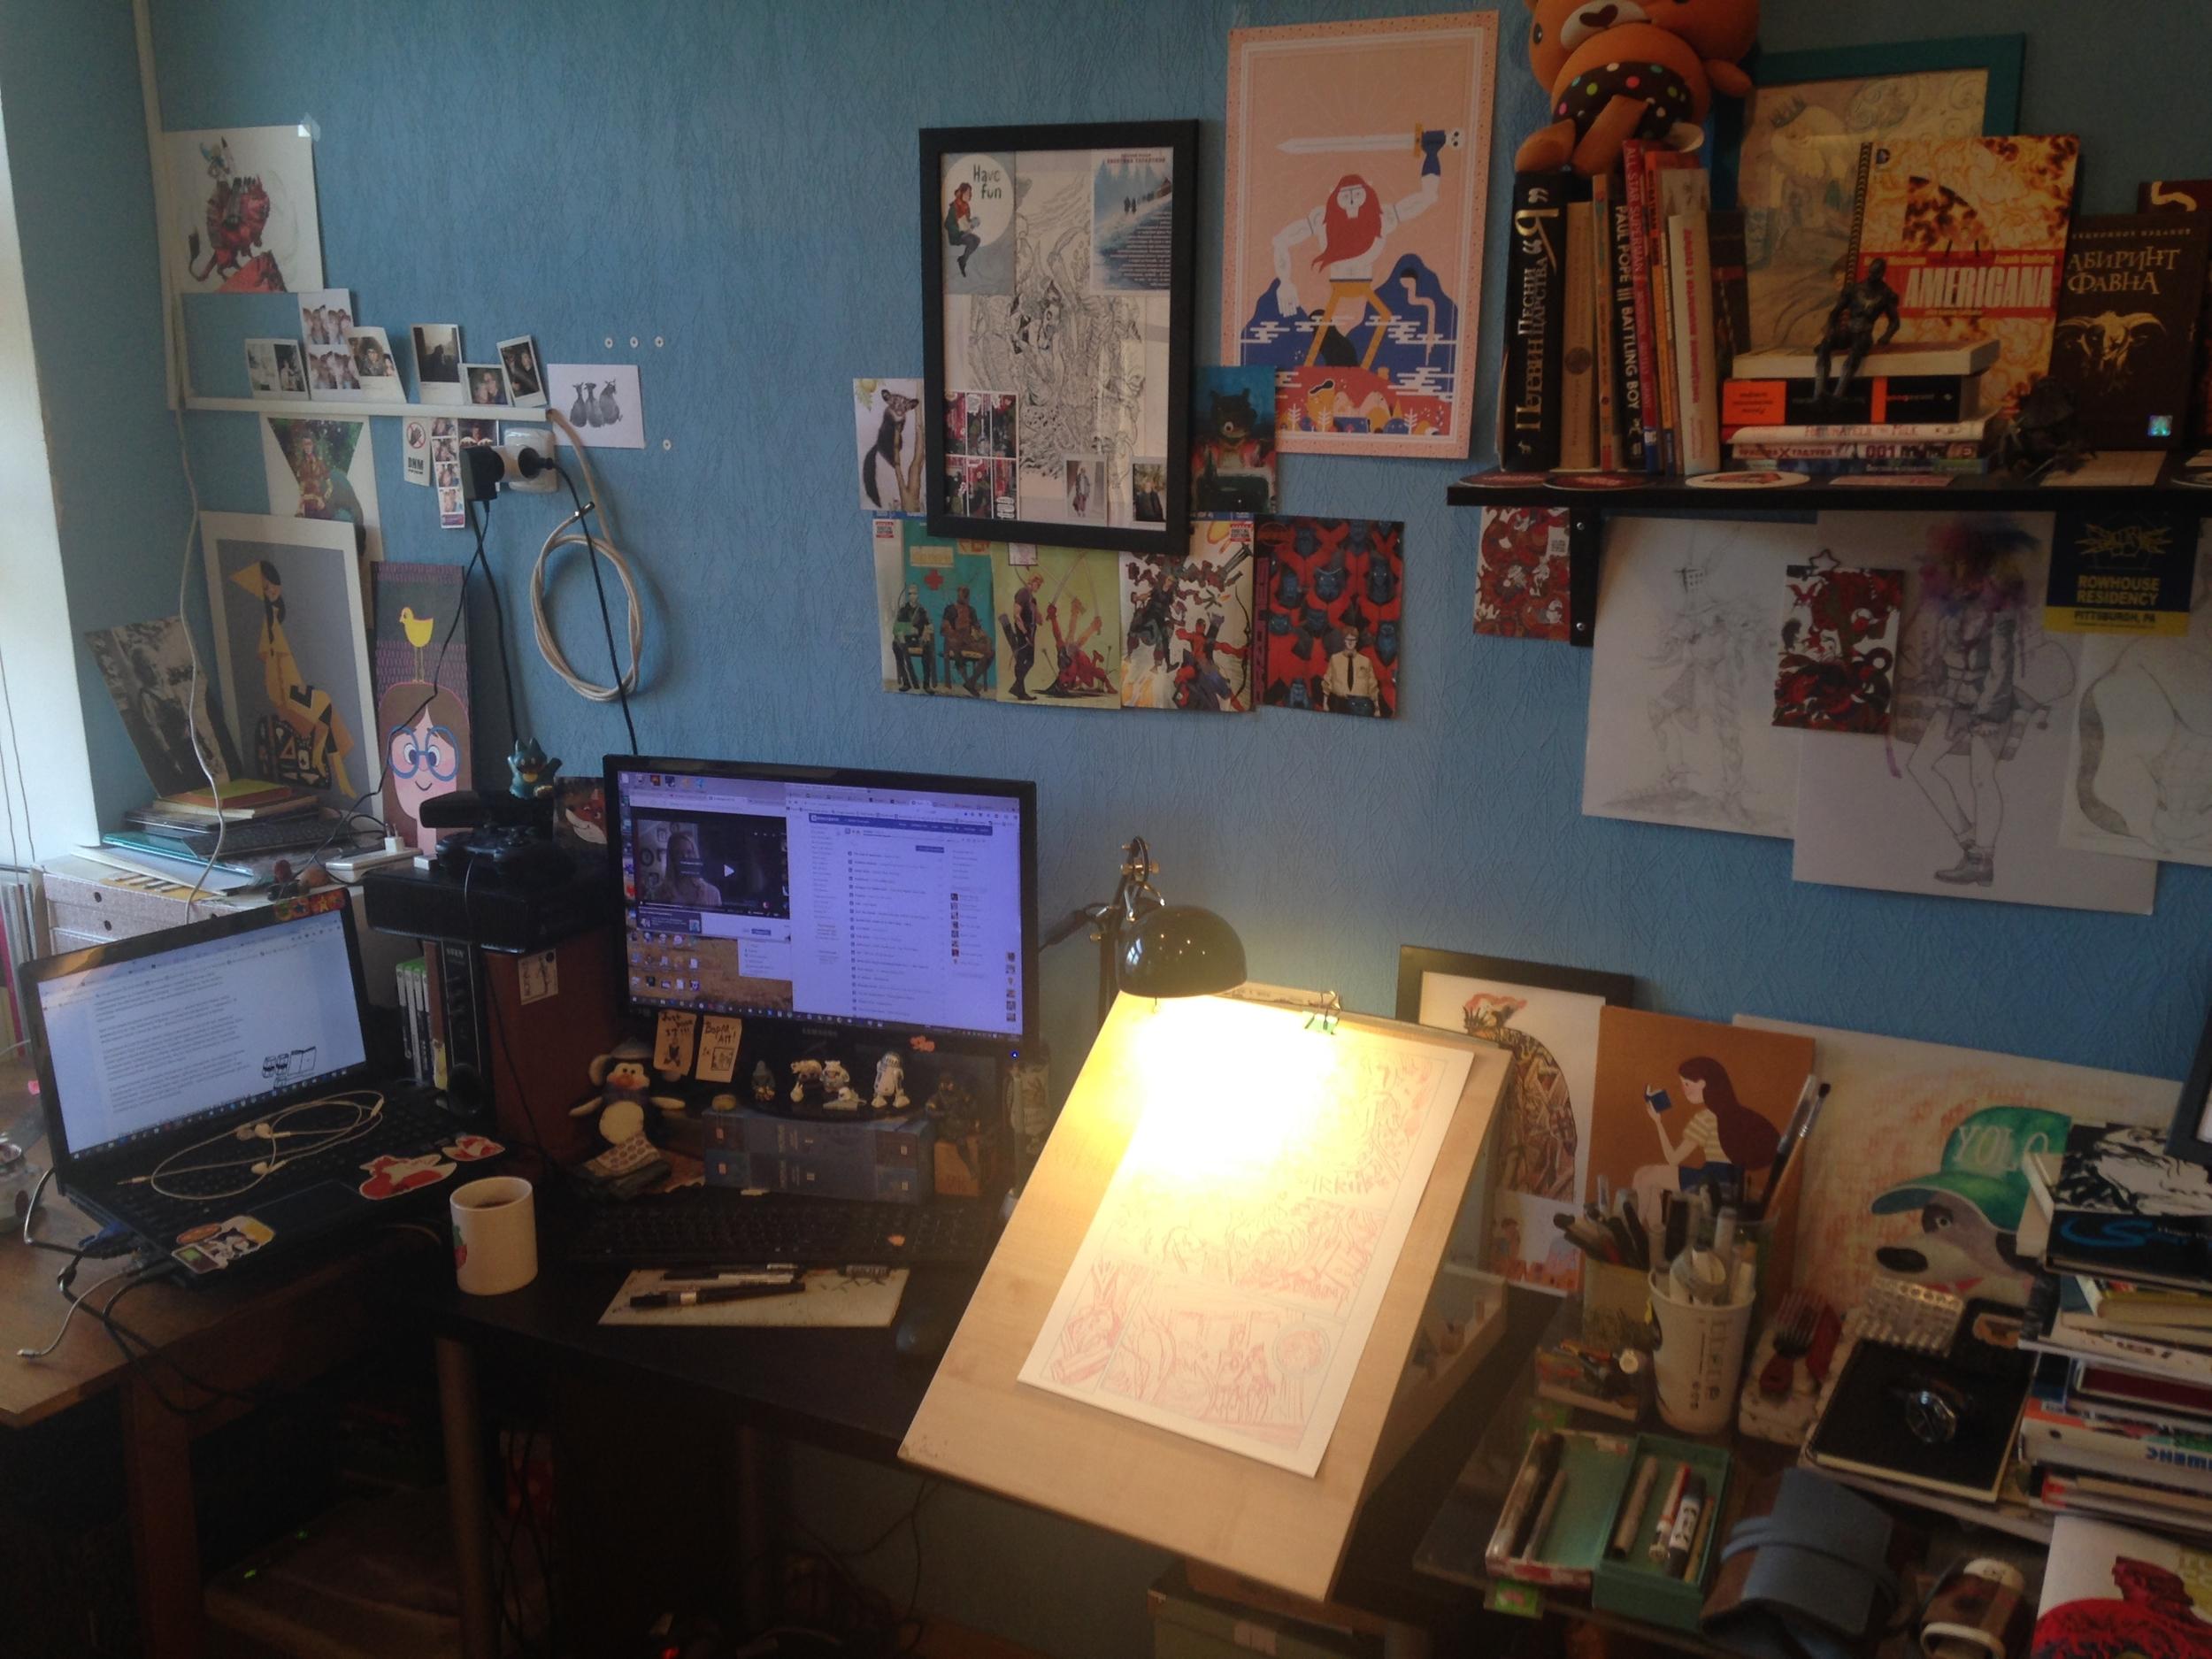 Artyom's workspace